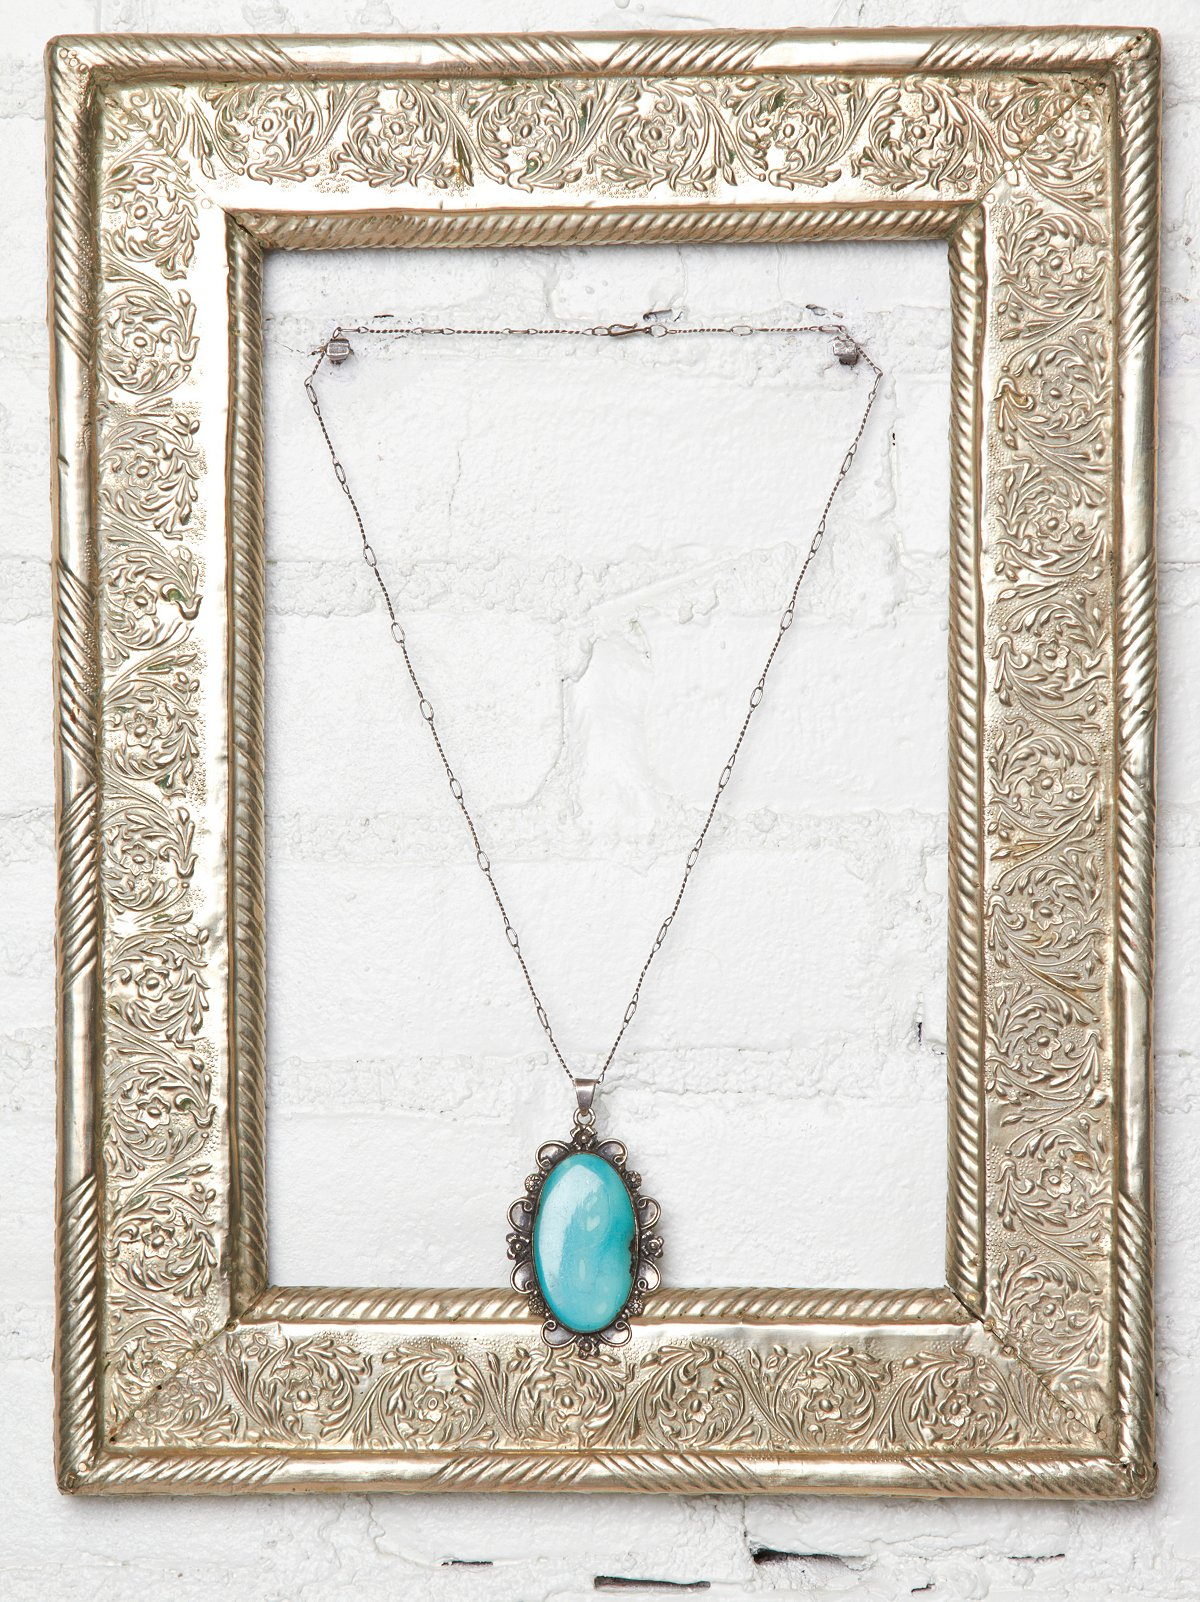 Vintage Handmade Stone Necklace